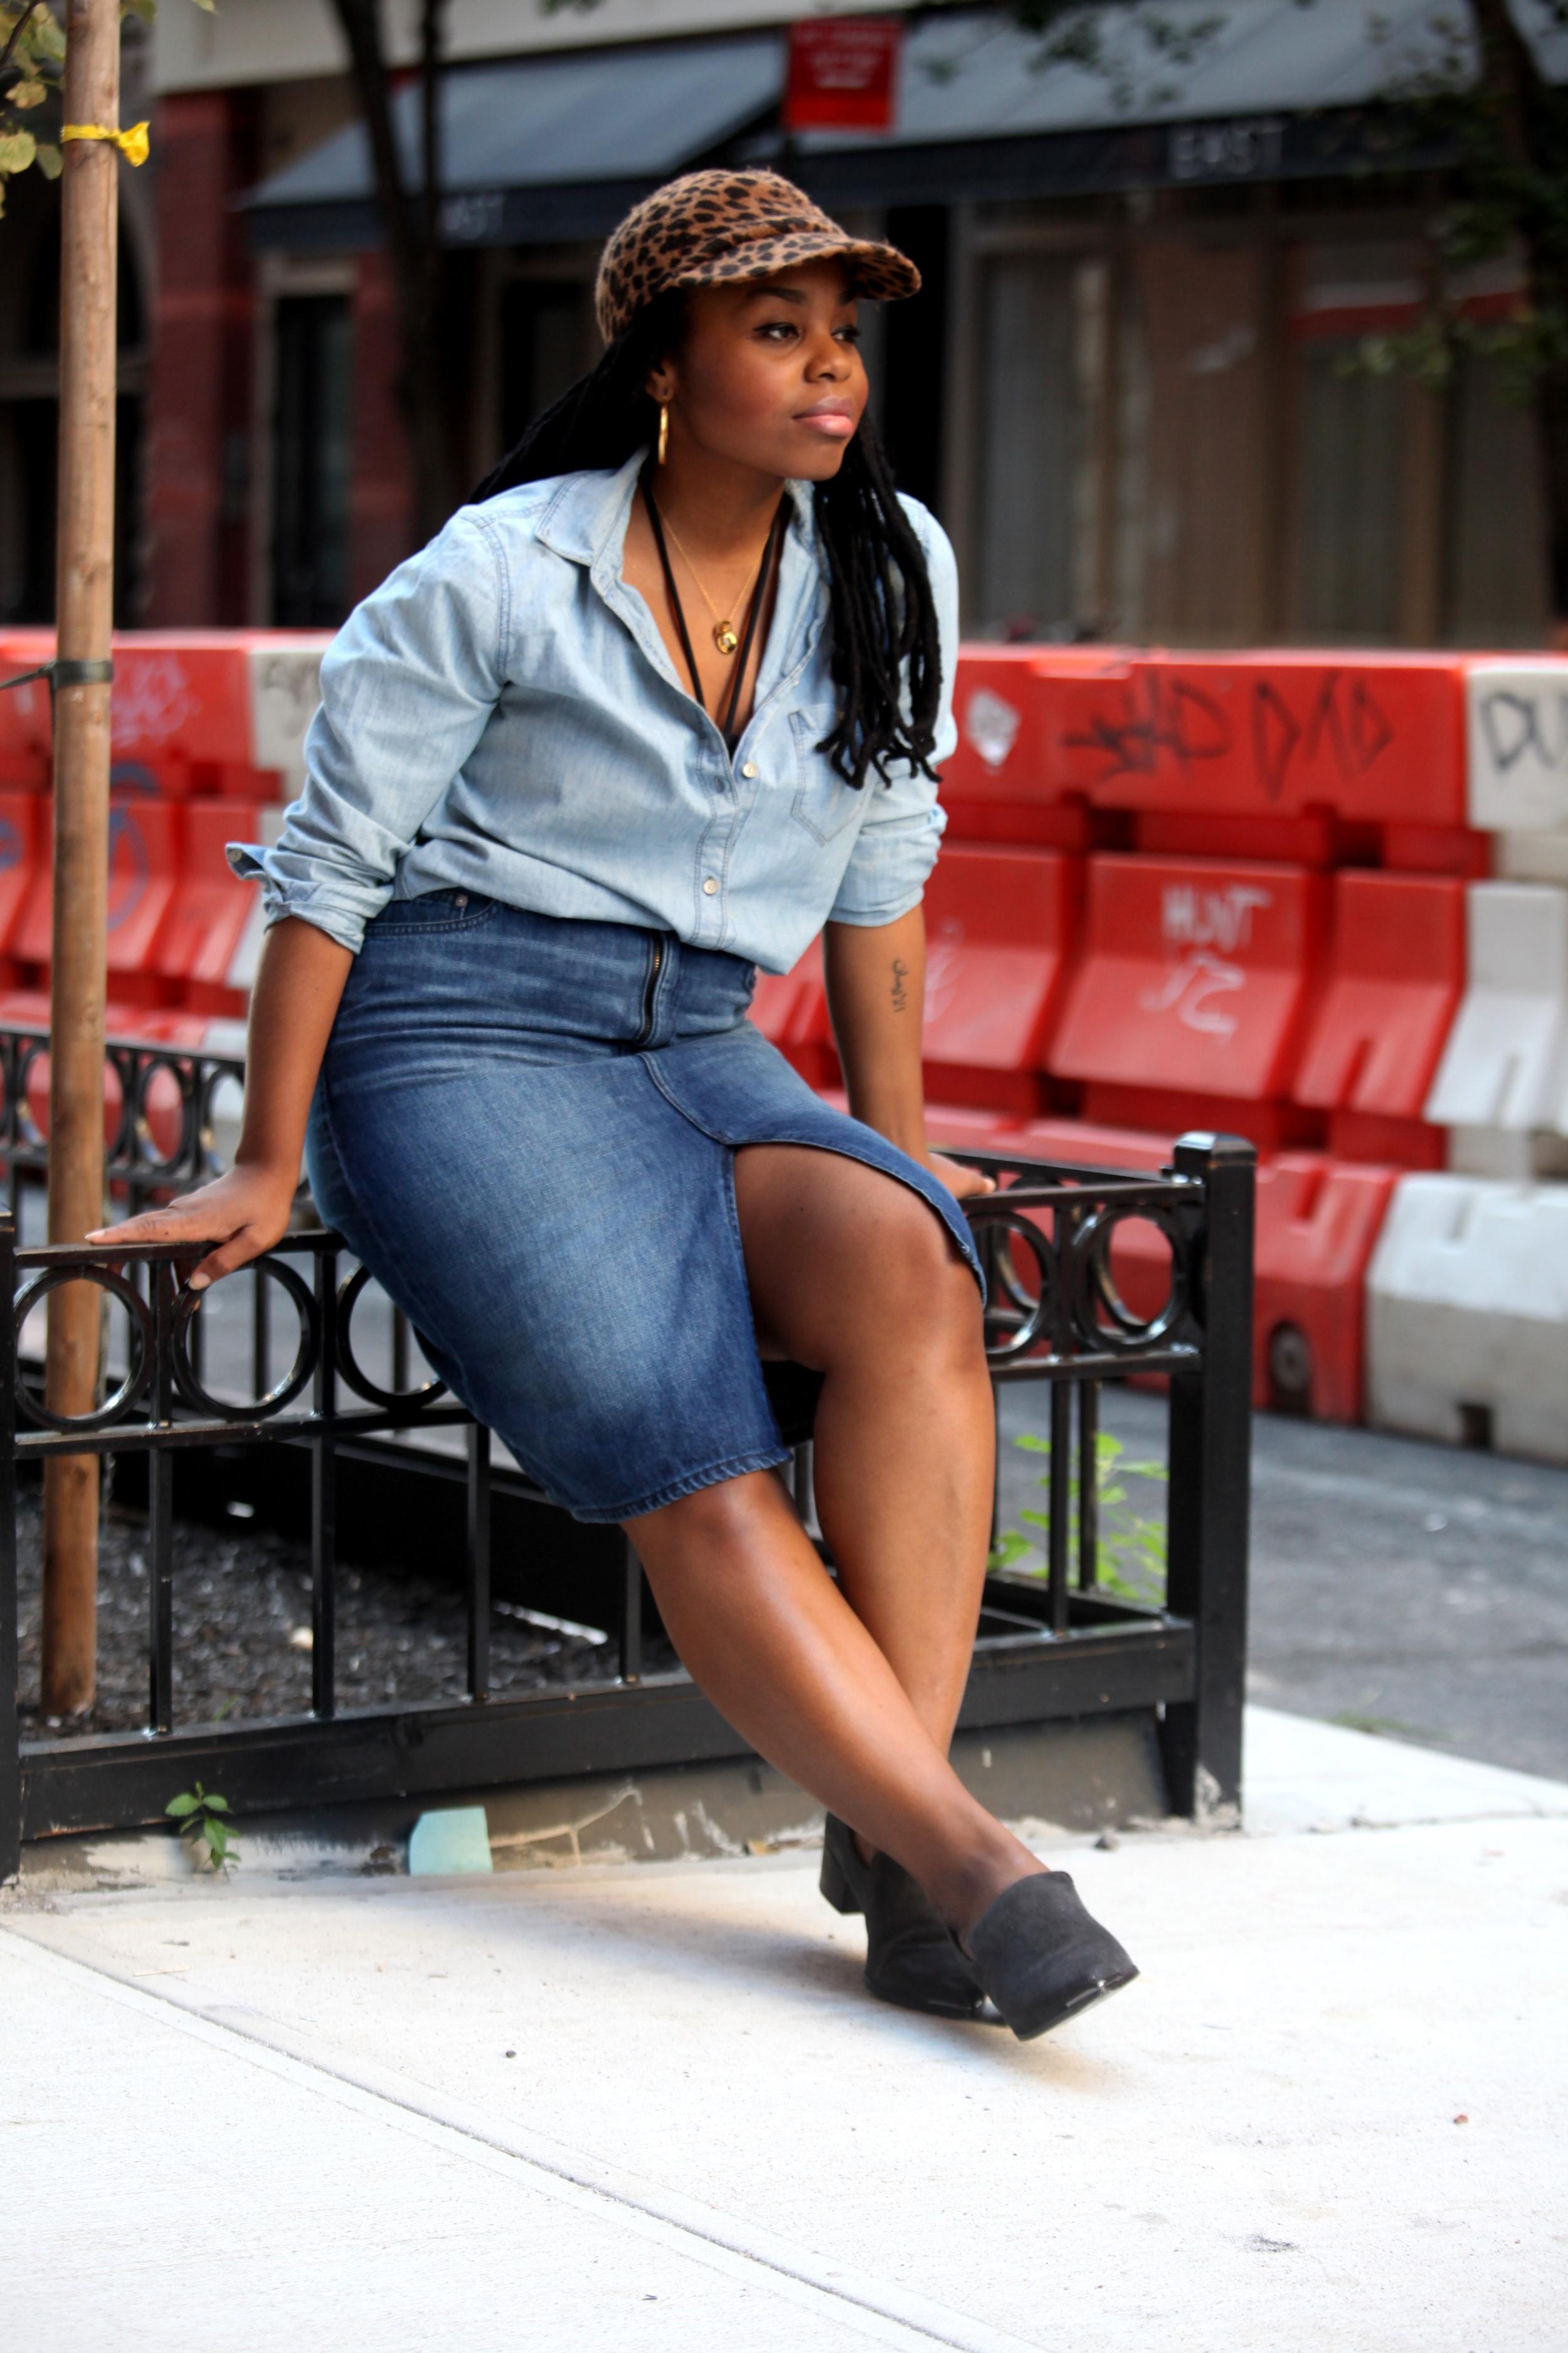 Hat: Nasty Gal, Top & Skirt: The Gap, Bikini top: Mara Hoffman, Shoes: Dolce Vita